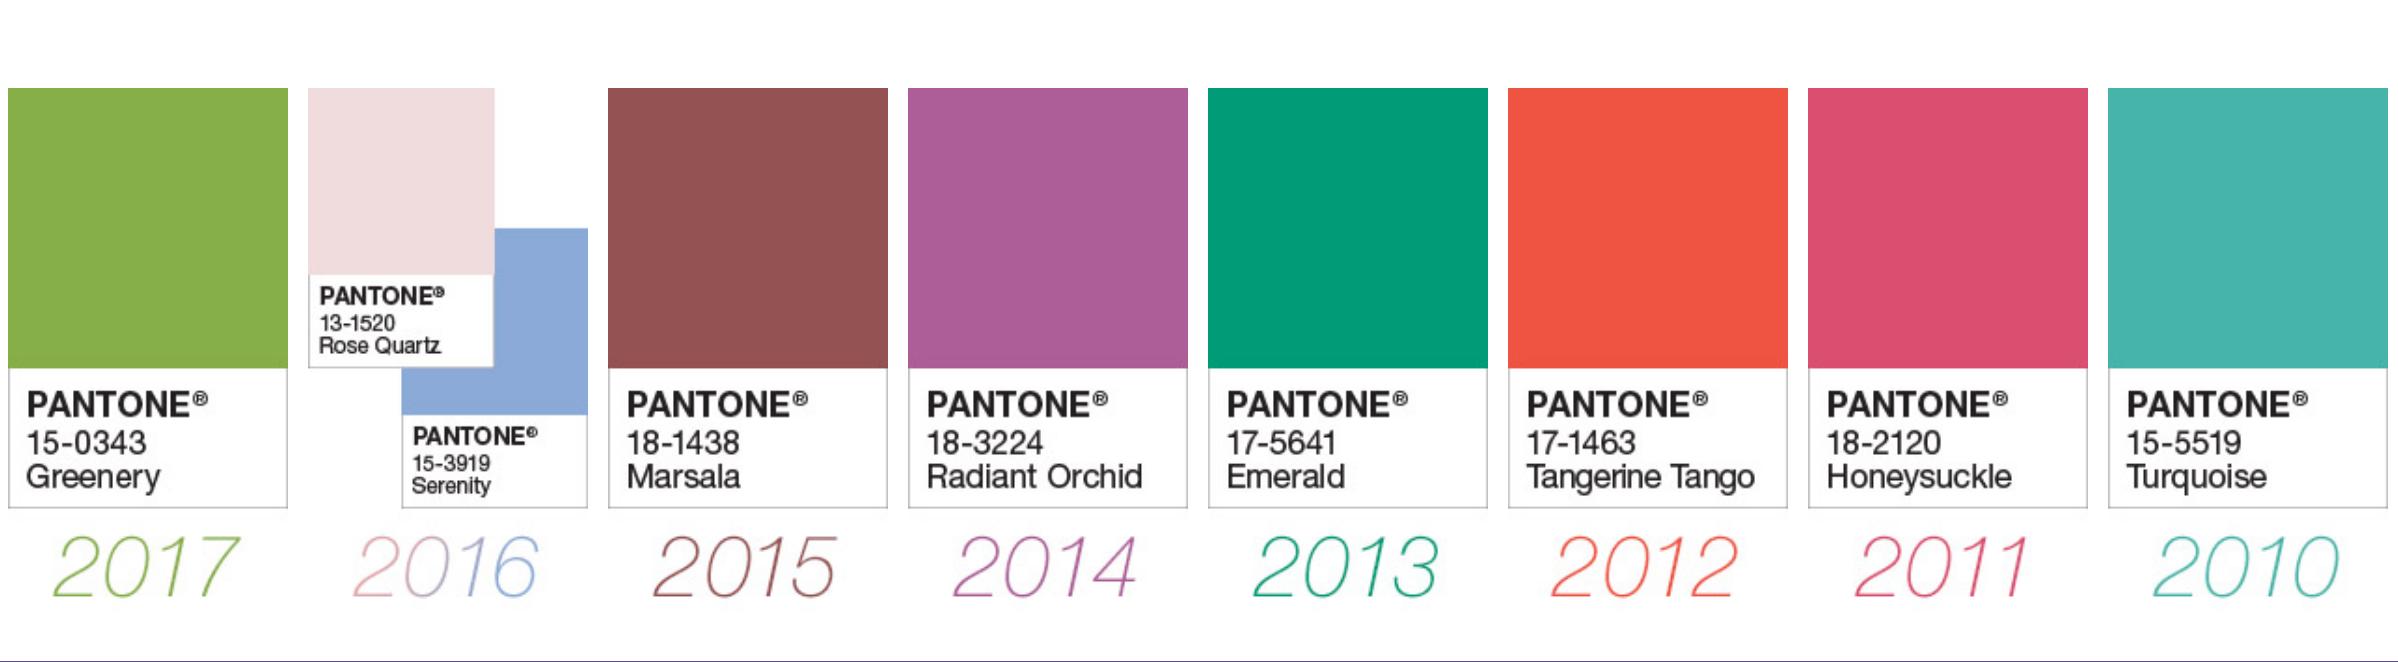 18-3838 Ultra Violet : la Pantone ® 2018